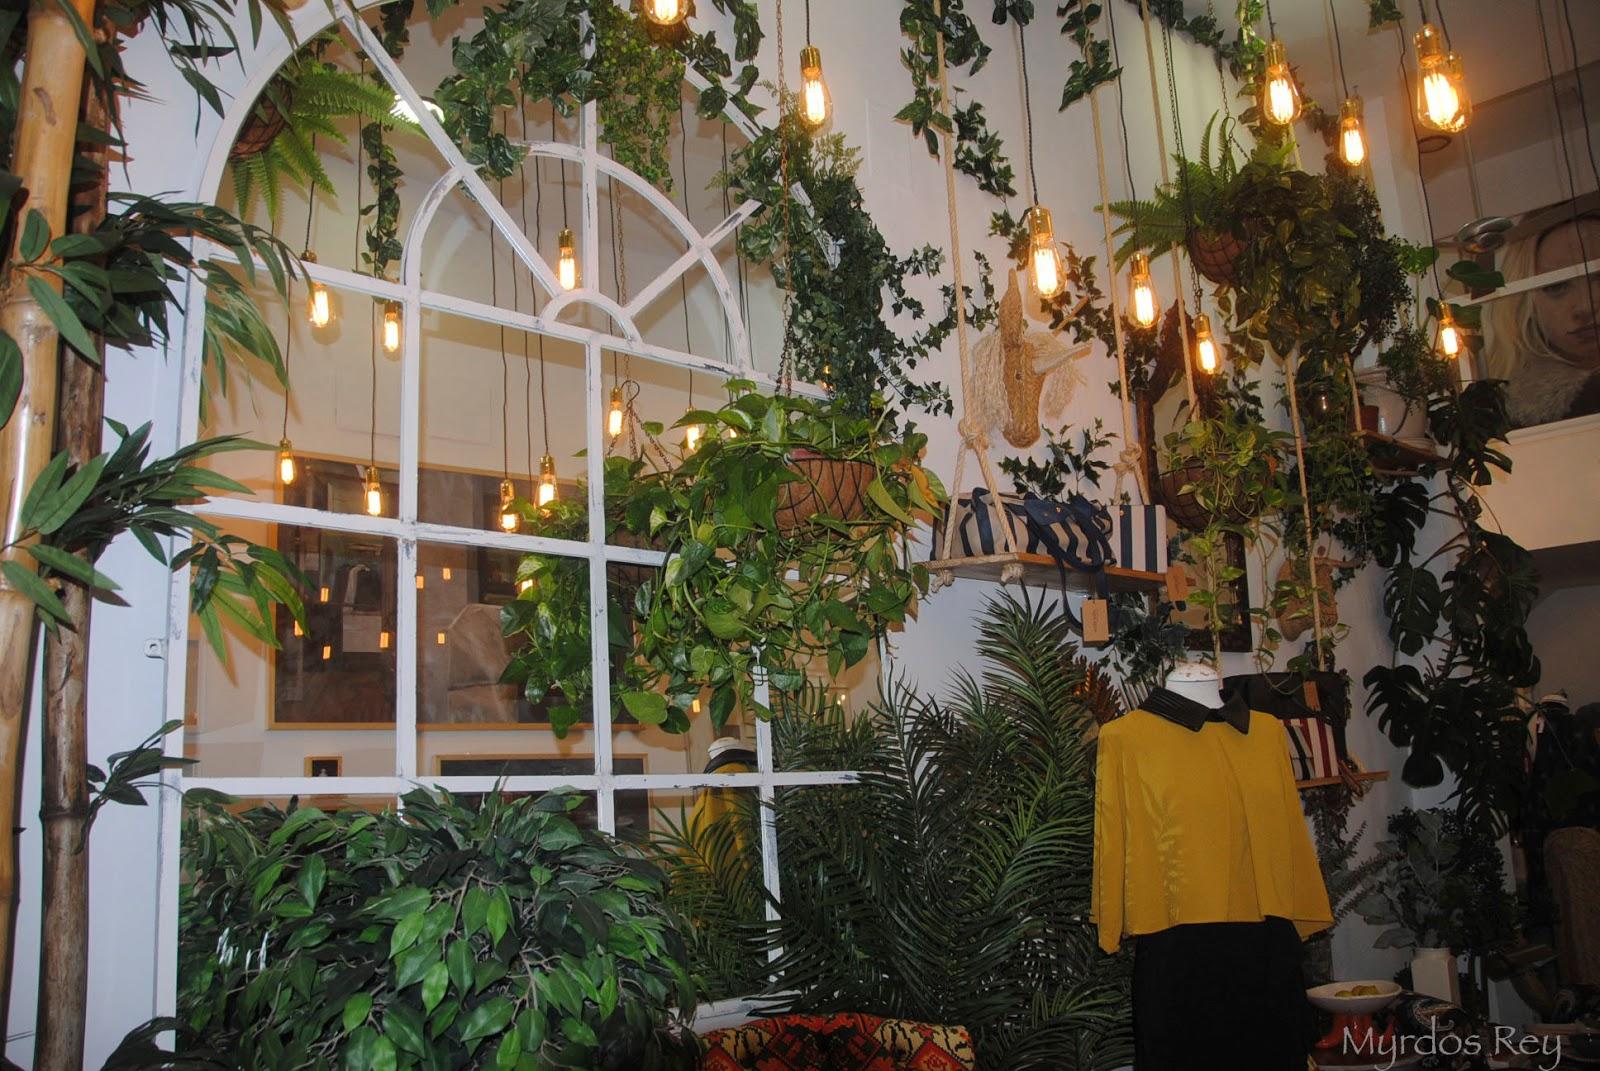 Sevilla cool hunter wabi sabi gallery shop un lugar m gico for Axex shop galeria jardin